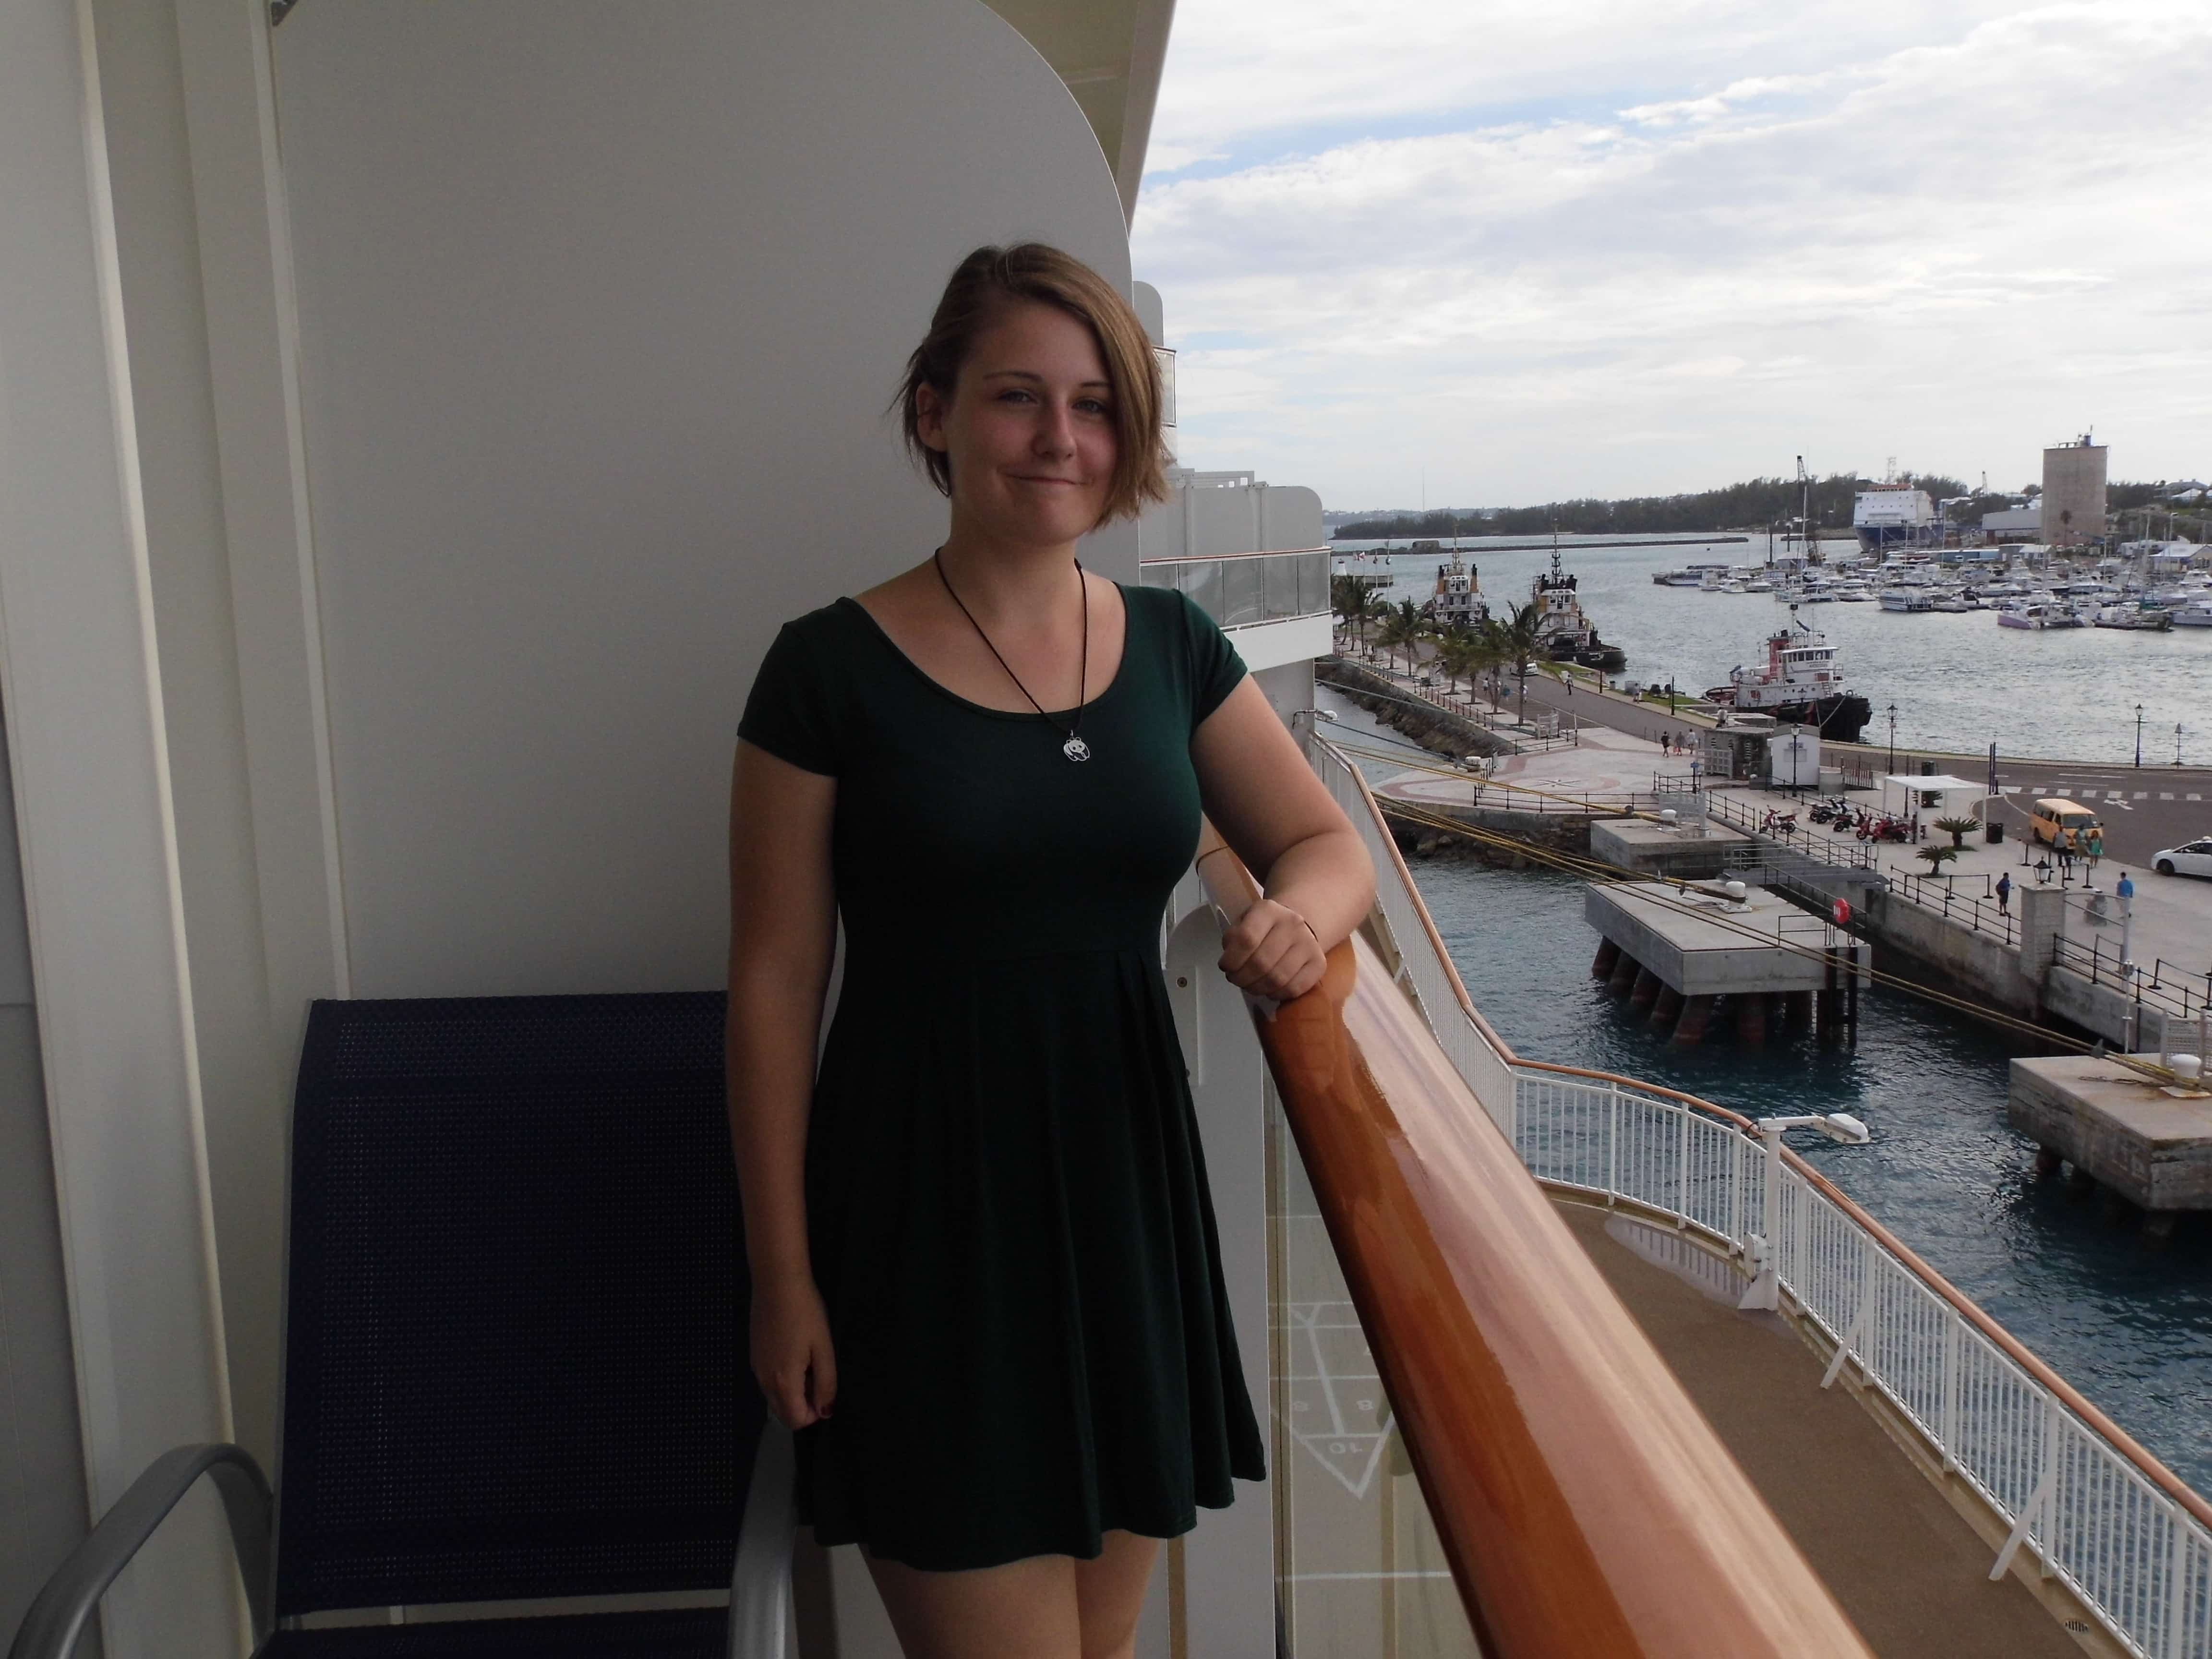 Norwegian Cruise line relaxed dress code